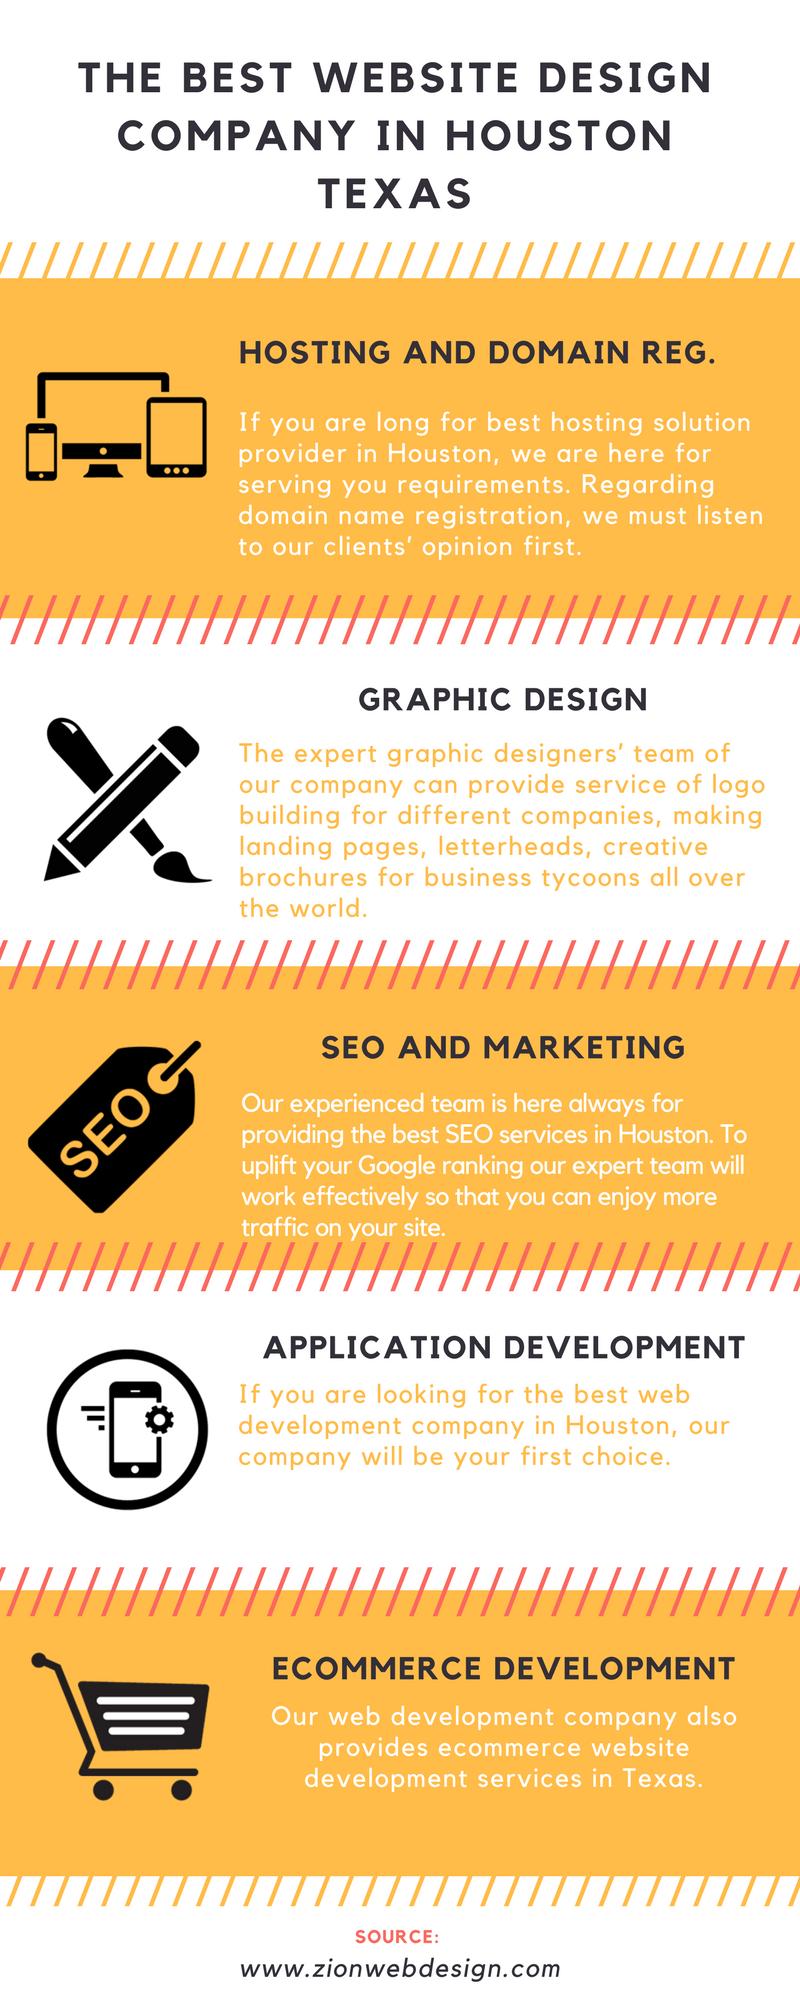 Zionwebdesign The Best Website Design Company In Houston Texas Responsivewebdesignhouston With Images Fun Website Design Website Design Company Website Design